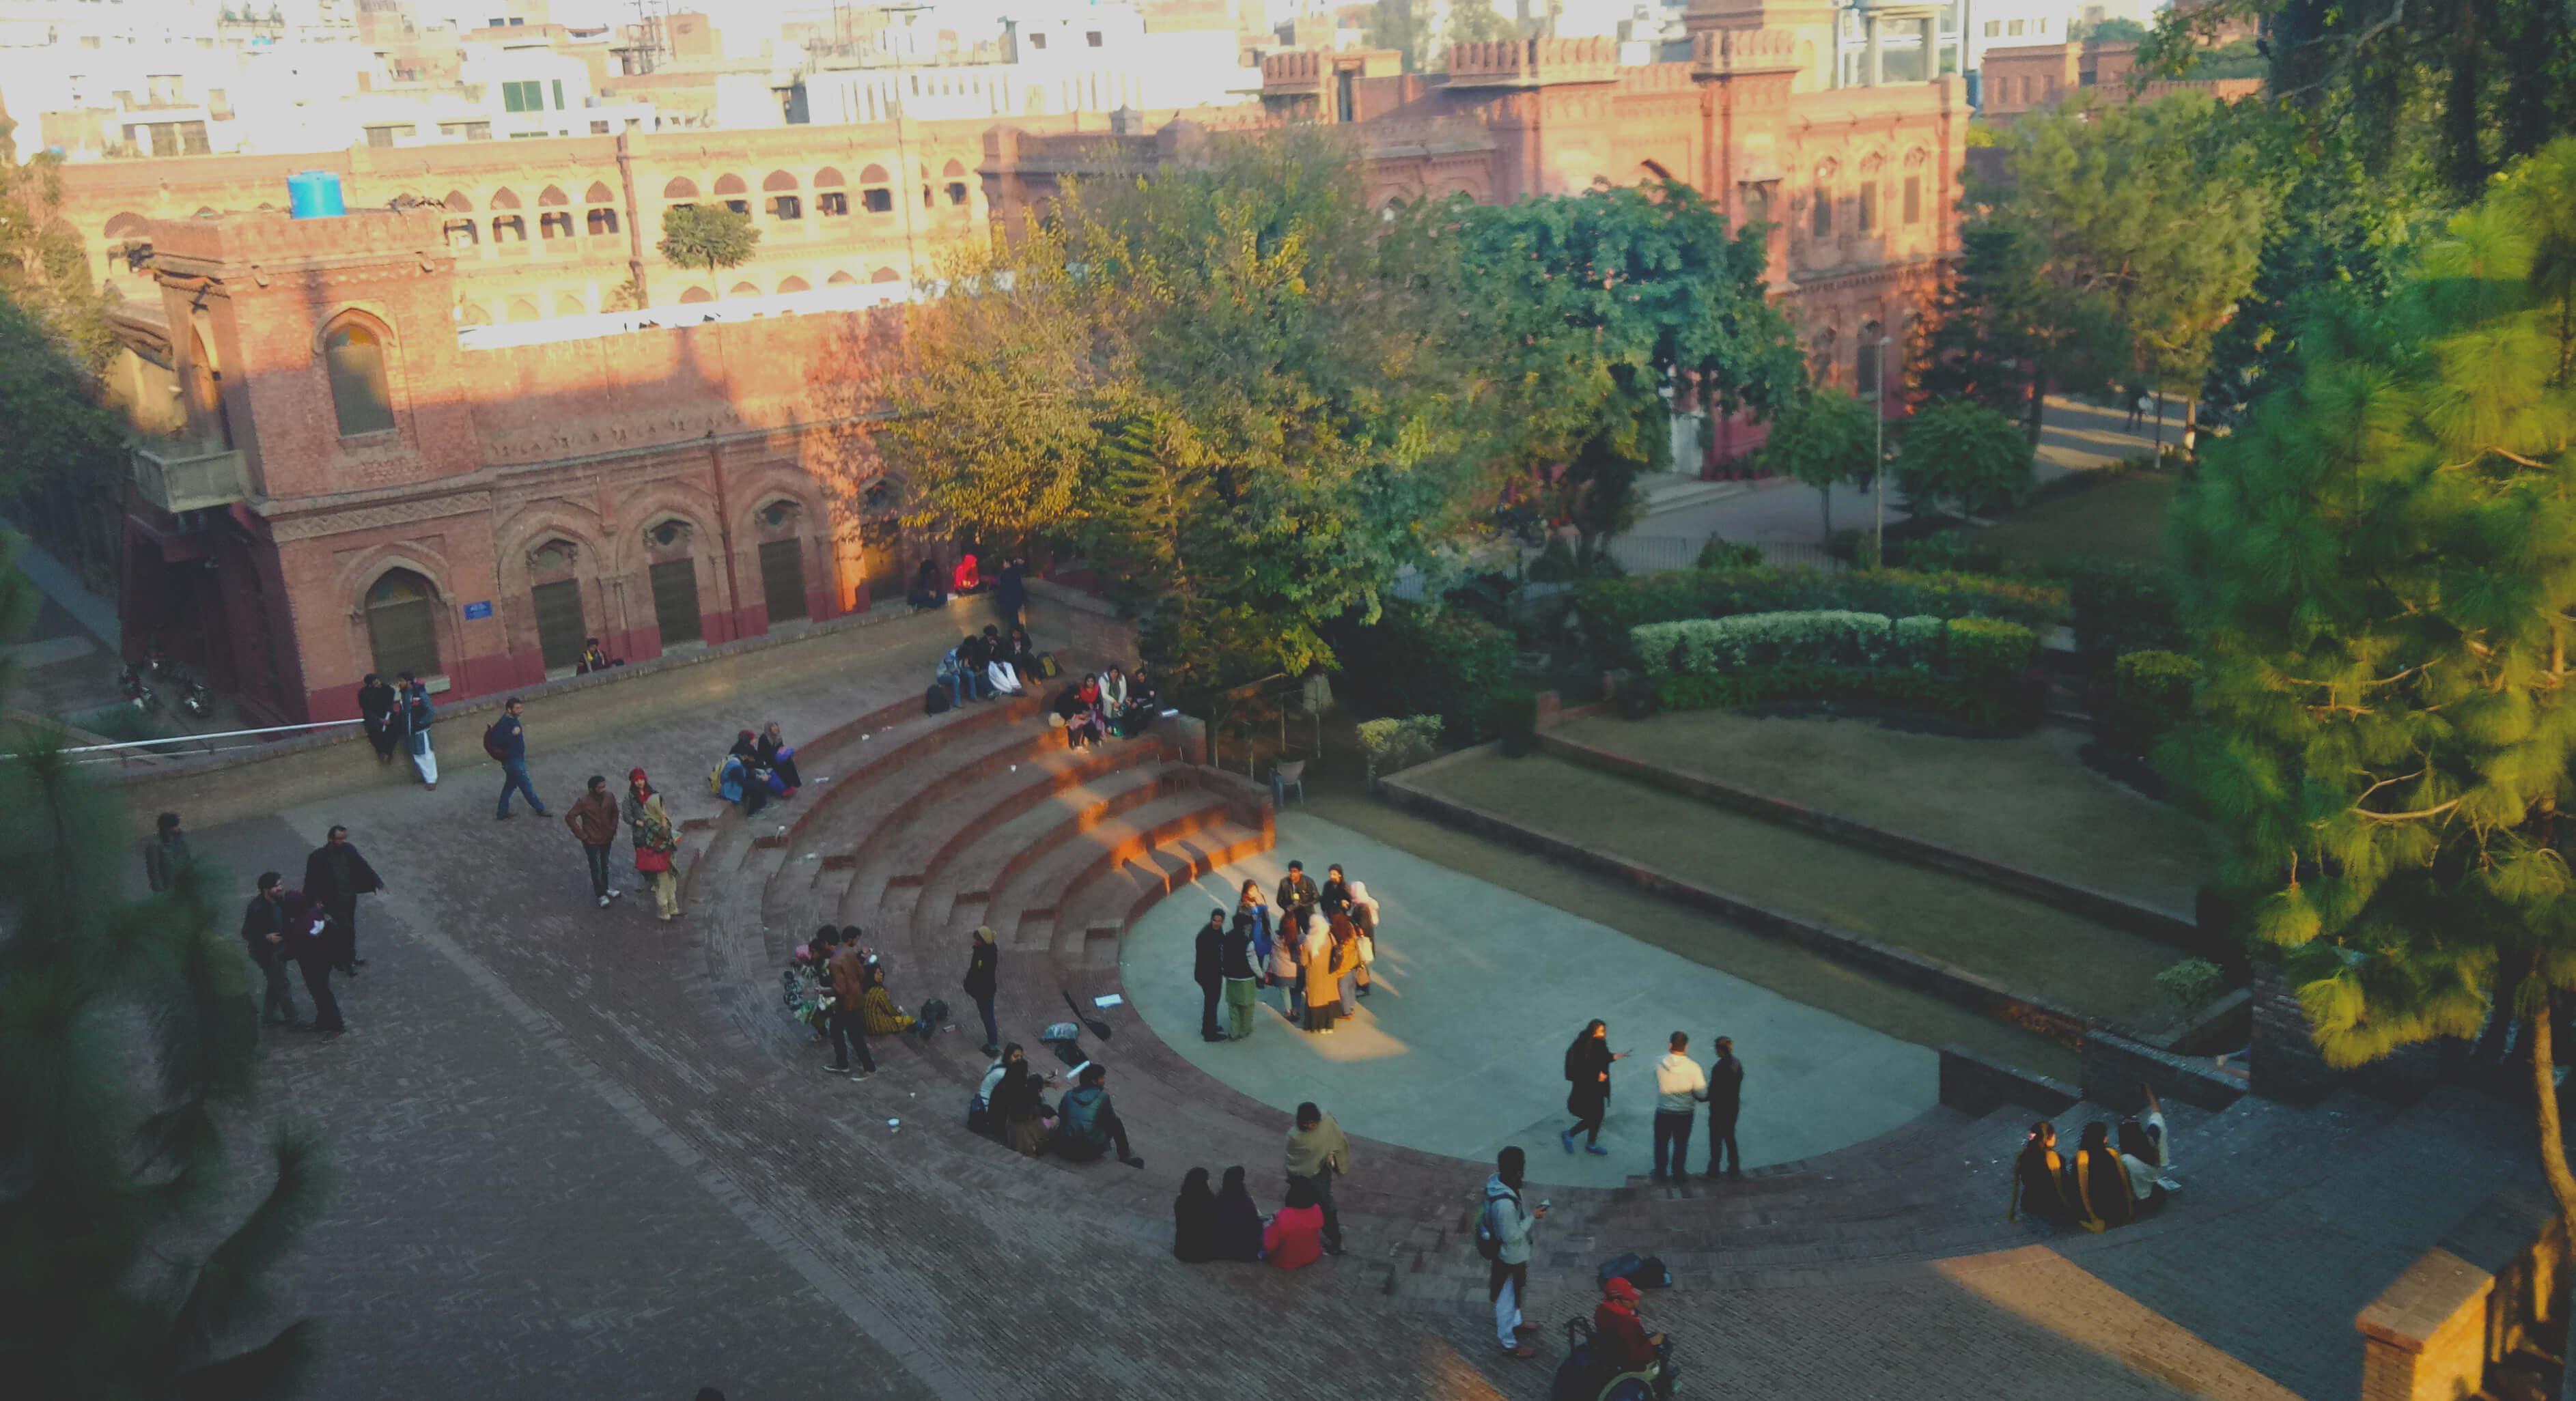 Edited 6 - Government College University